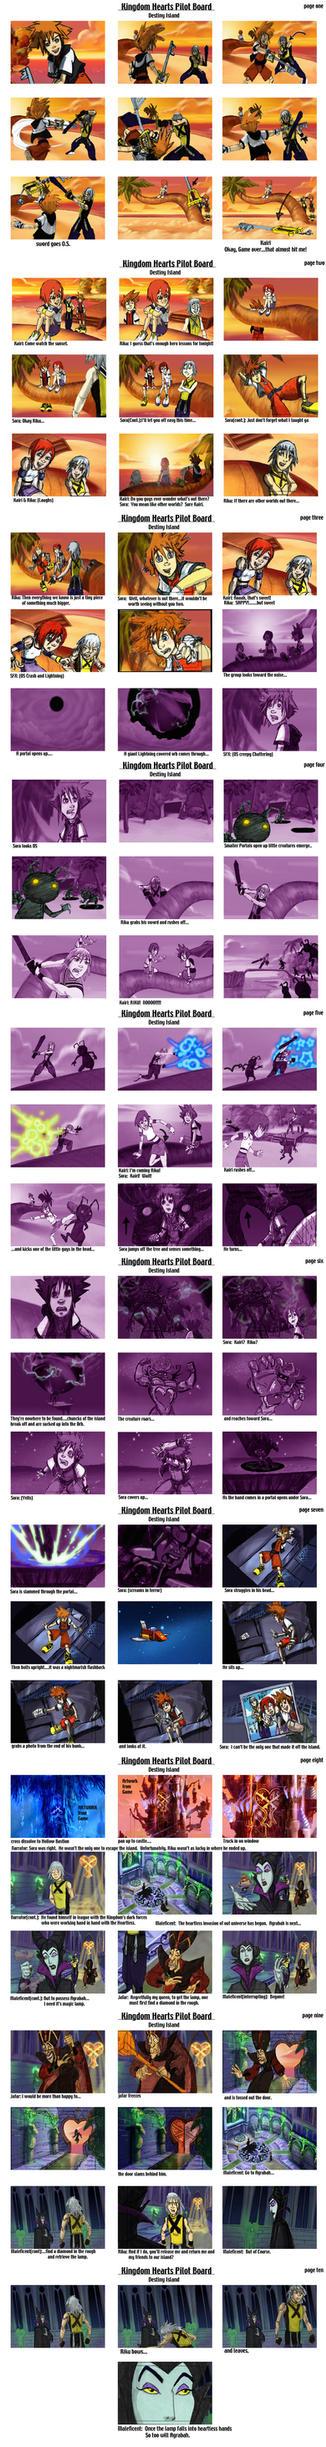 Kingdom Hearts Color Board by SethKearsley